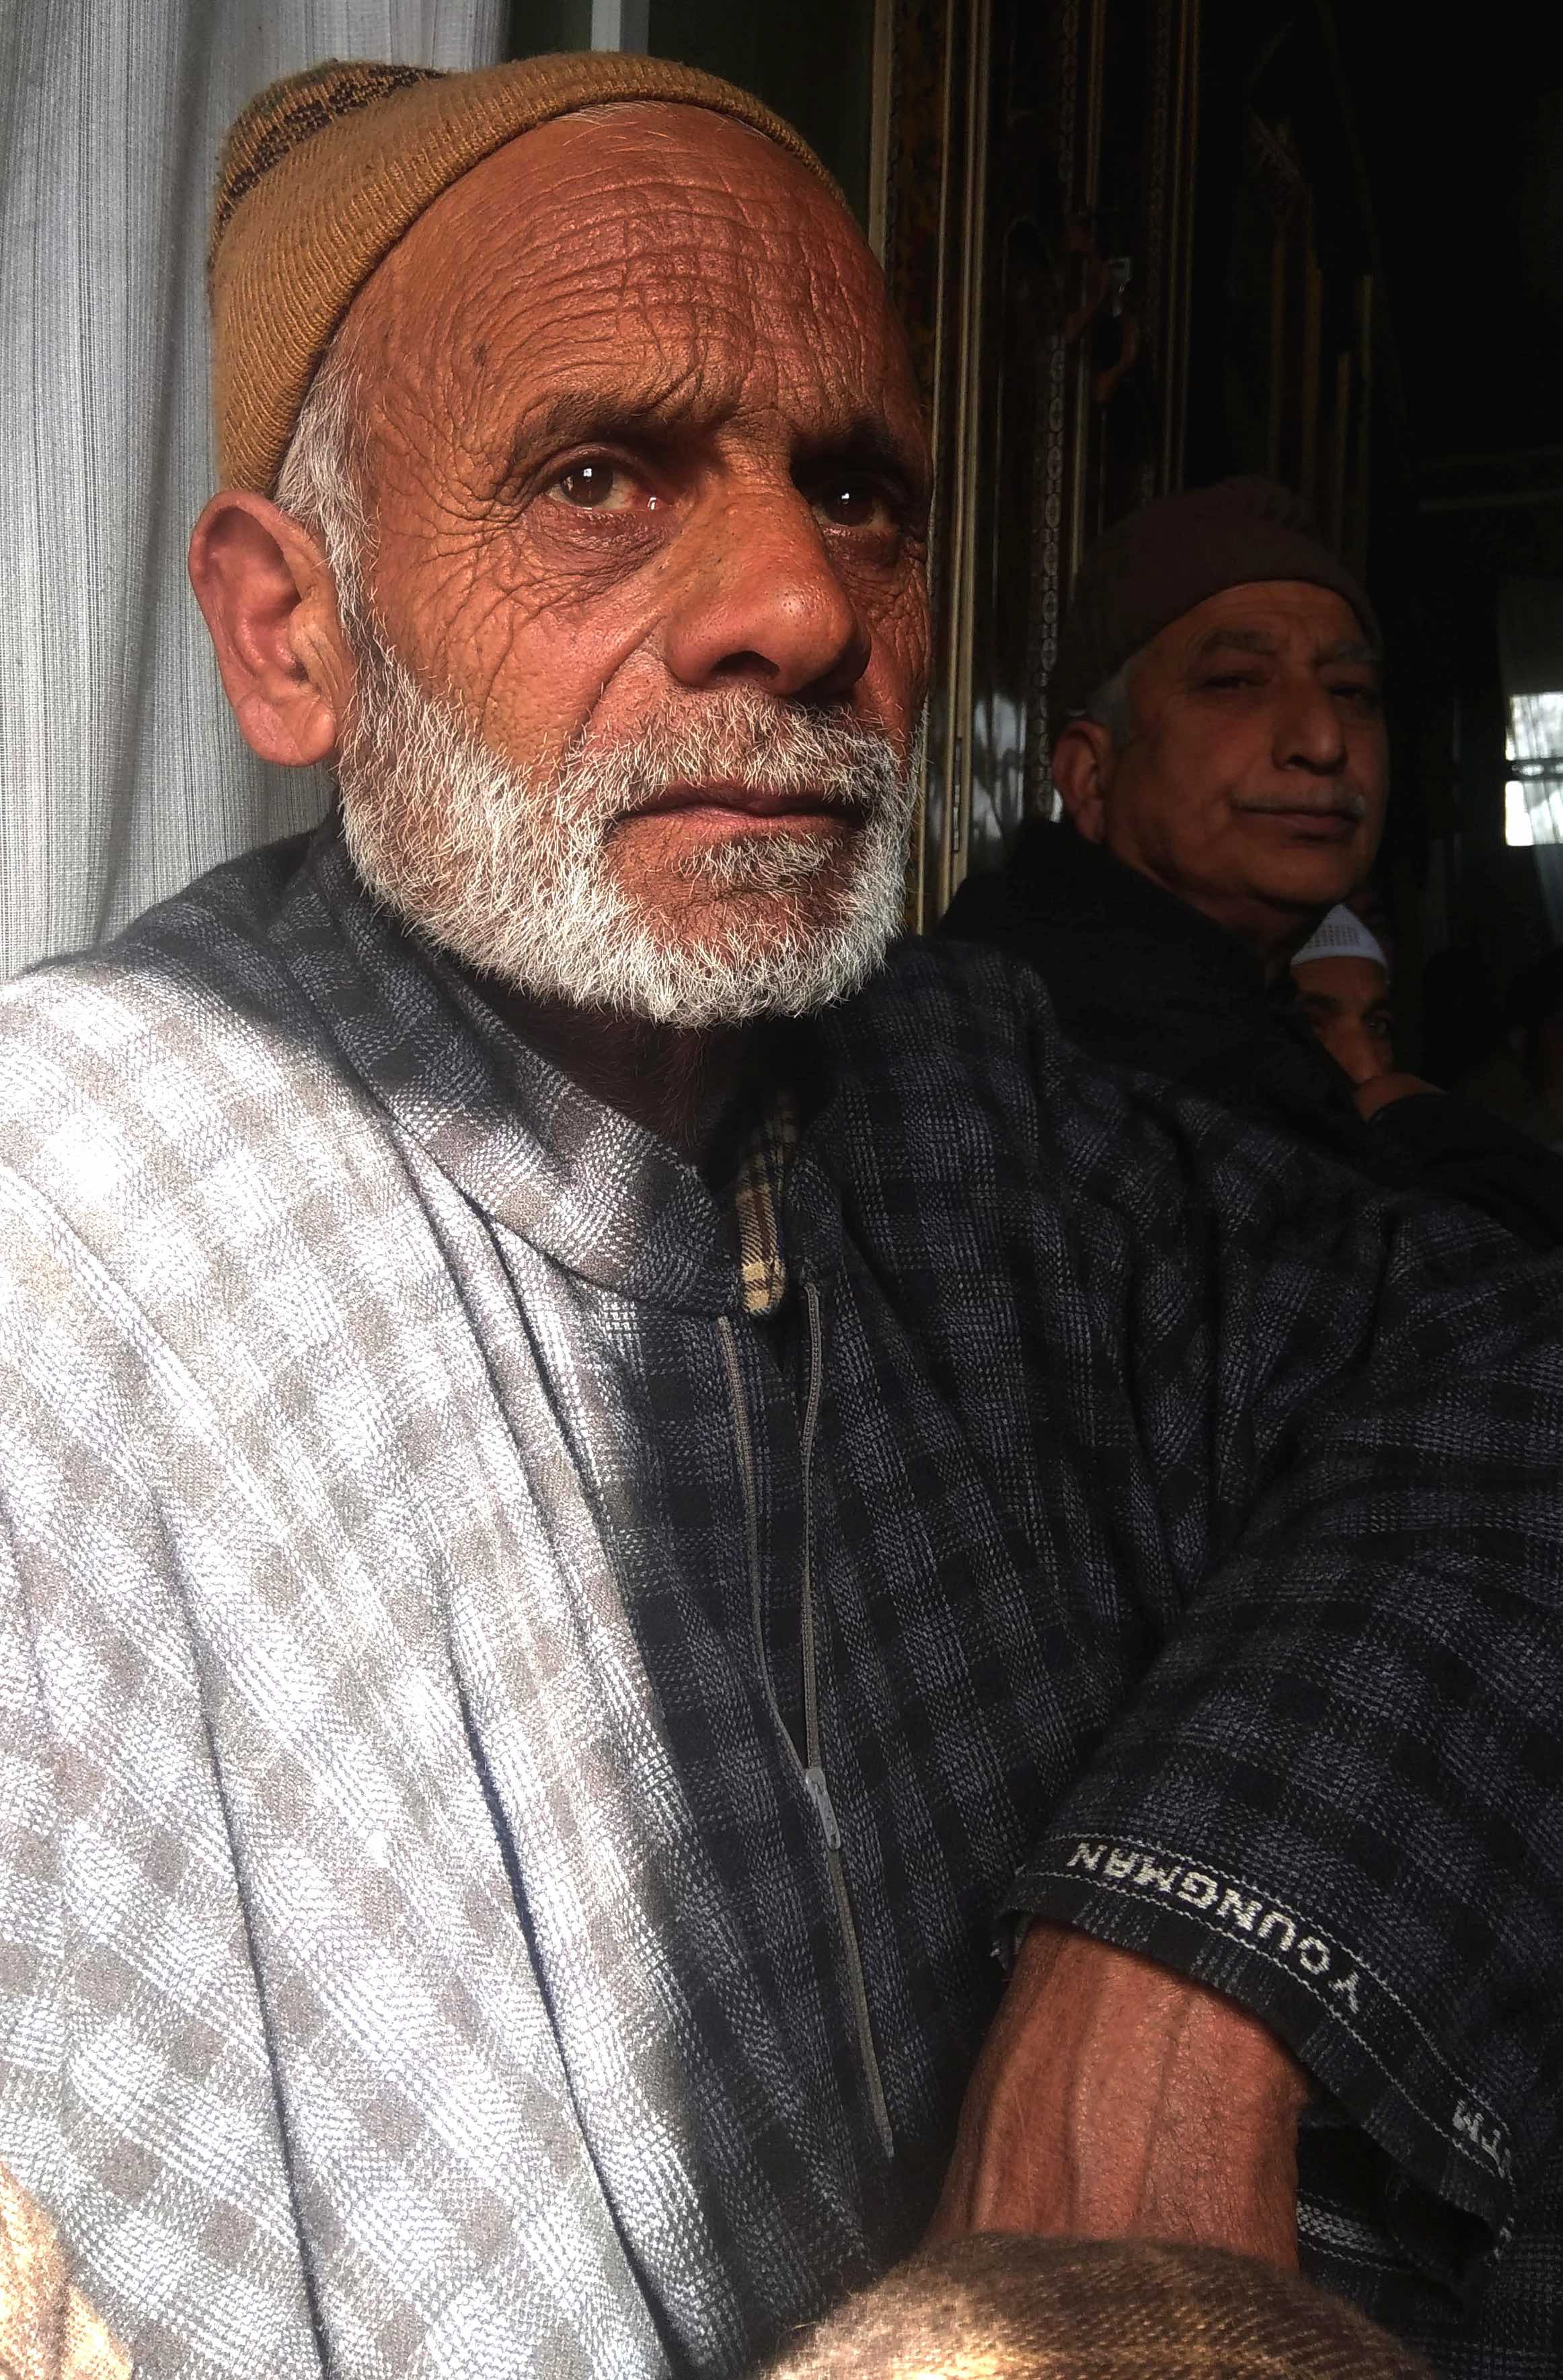 Javaid Ahmad's father, Abdul Rashid Bhat. Credit: Mudasir Ahmad